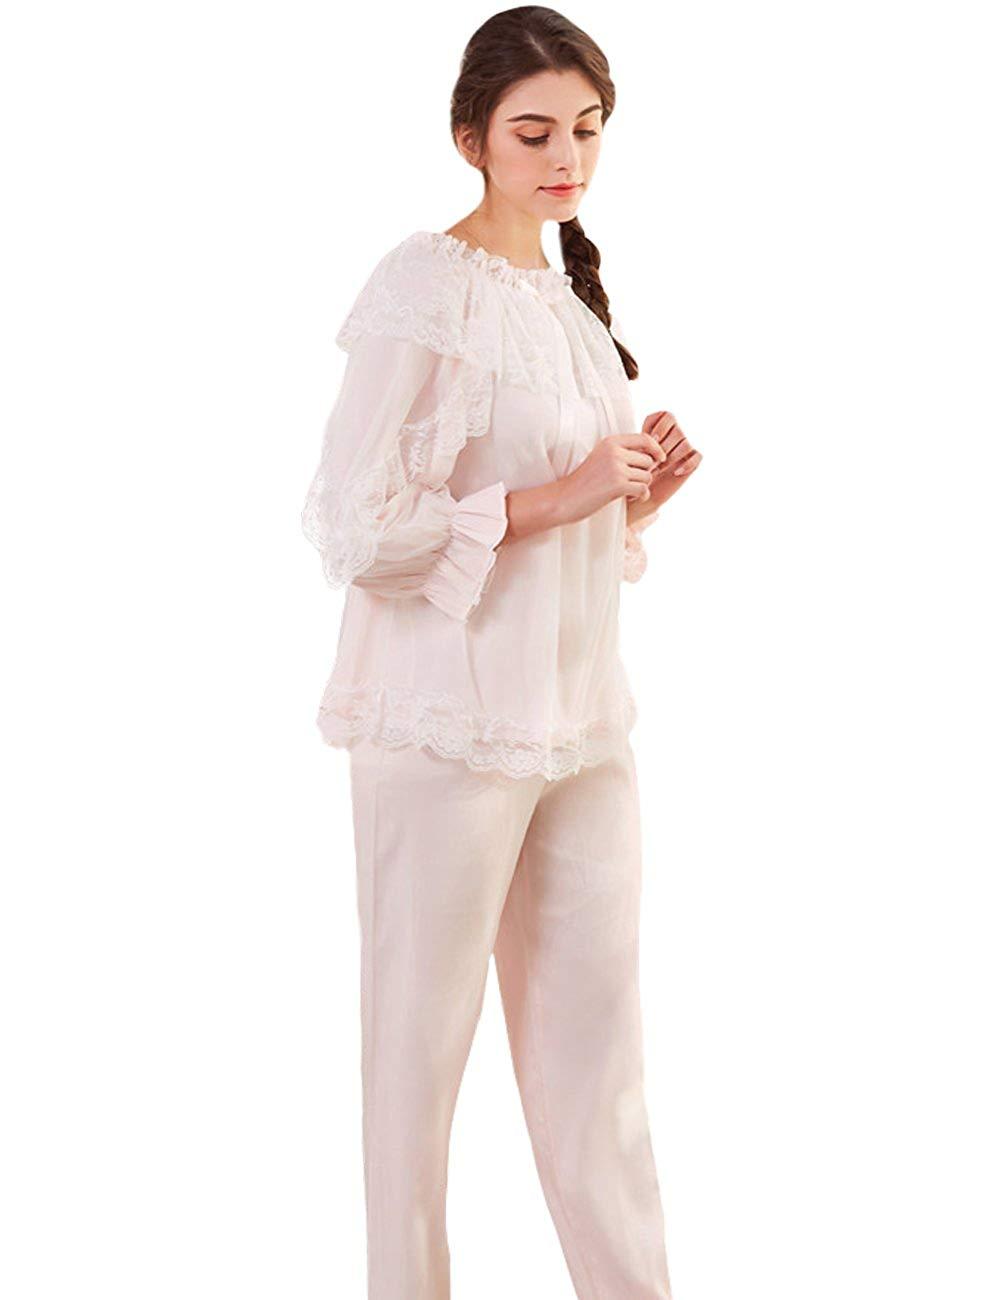 ... Full Length Nightdress 37.99. Aikosha Womens Victorian Style Long Flare  Sleeve Off Shoulder Lace Cotton Pajama Set d9a1fabc3